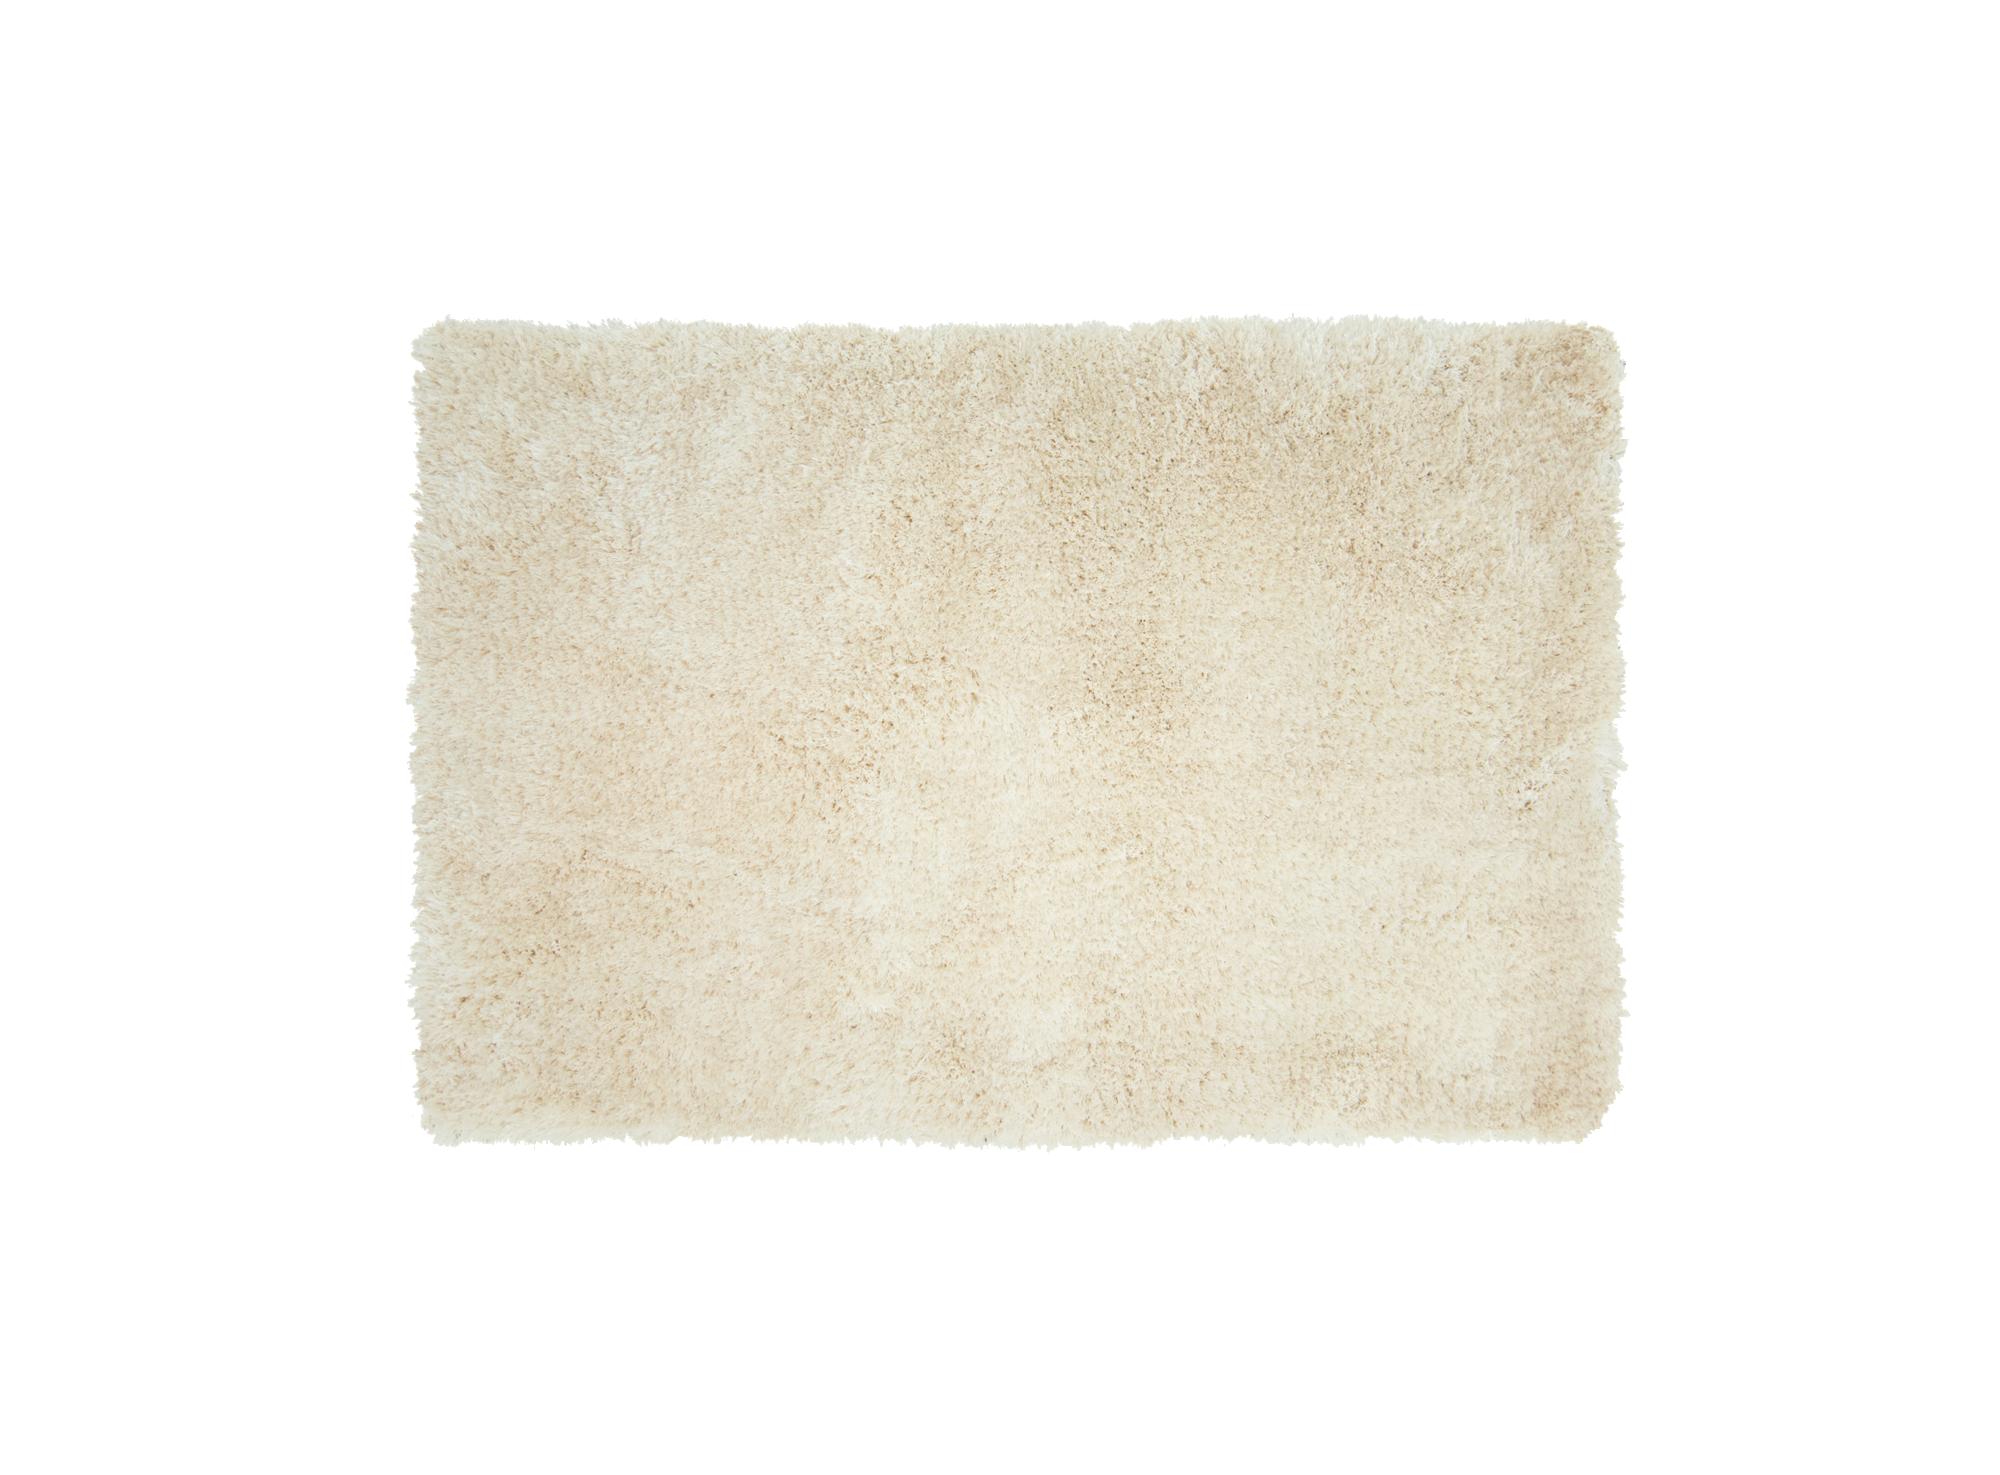 Tapis 160x230 100% polyester dos 100% coton coloris beige densite 21 ...